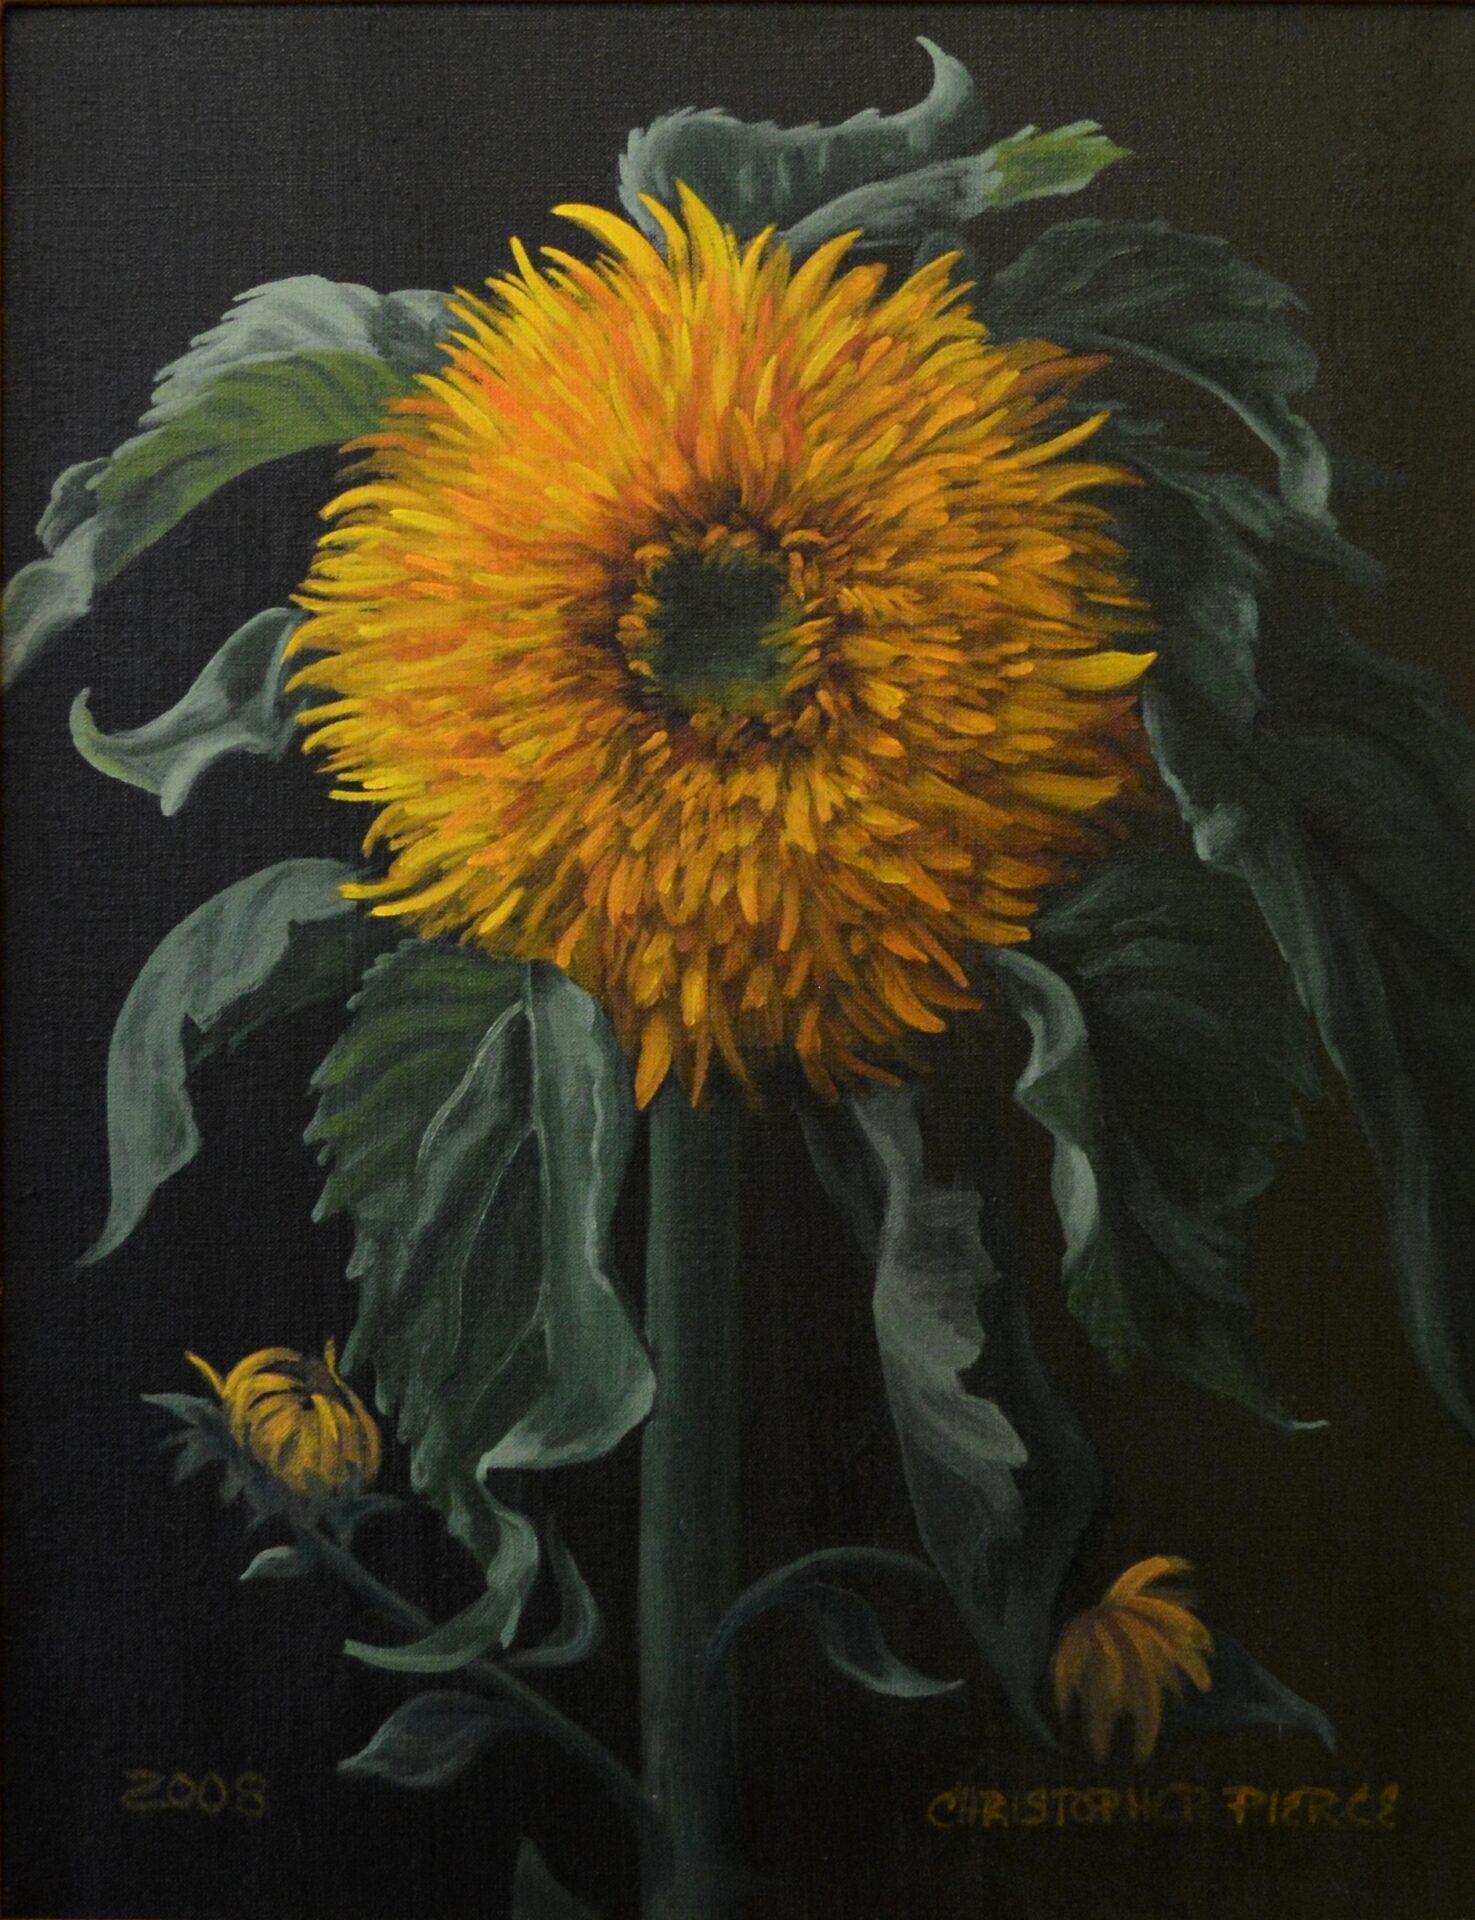 Christopher Pierce - Double Sunflower